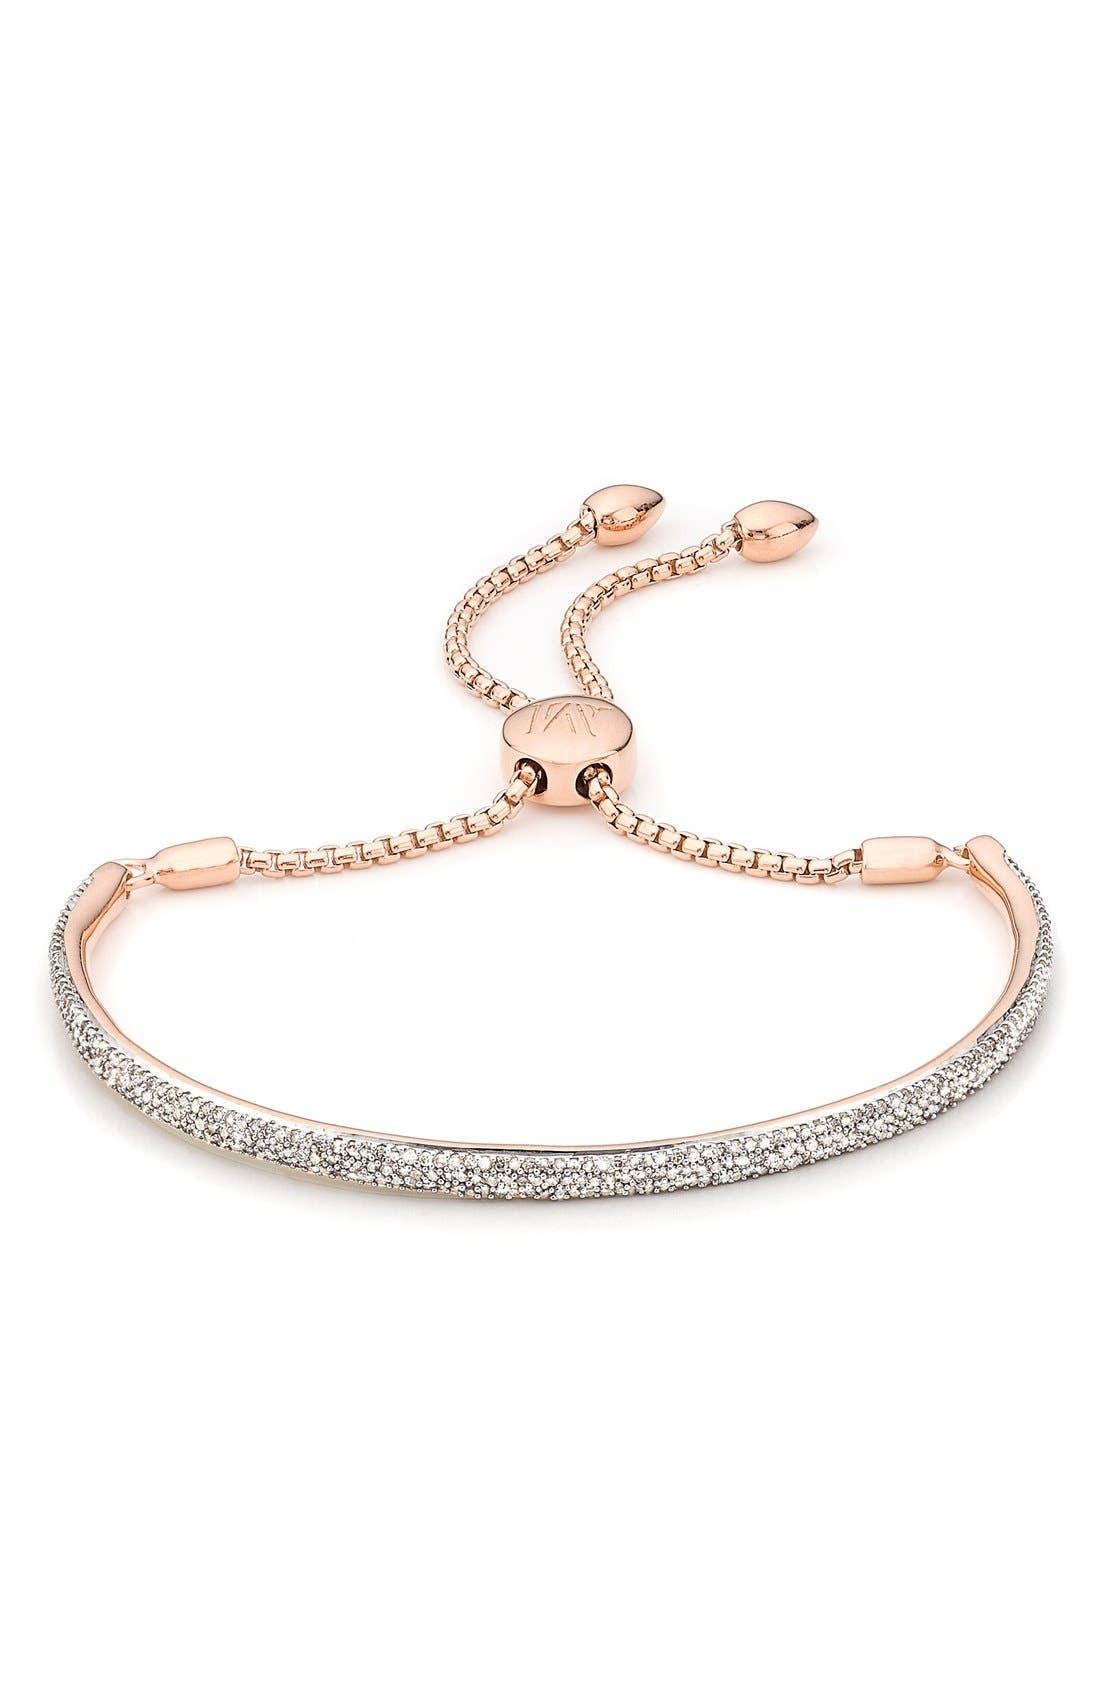 Monica Vinader 'Fiji' Diamond Station Bracelet